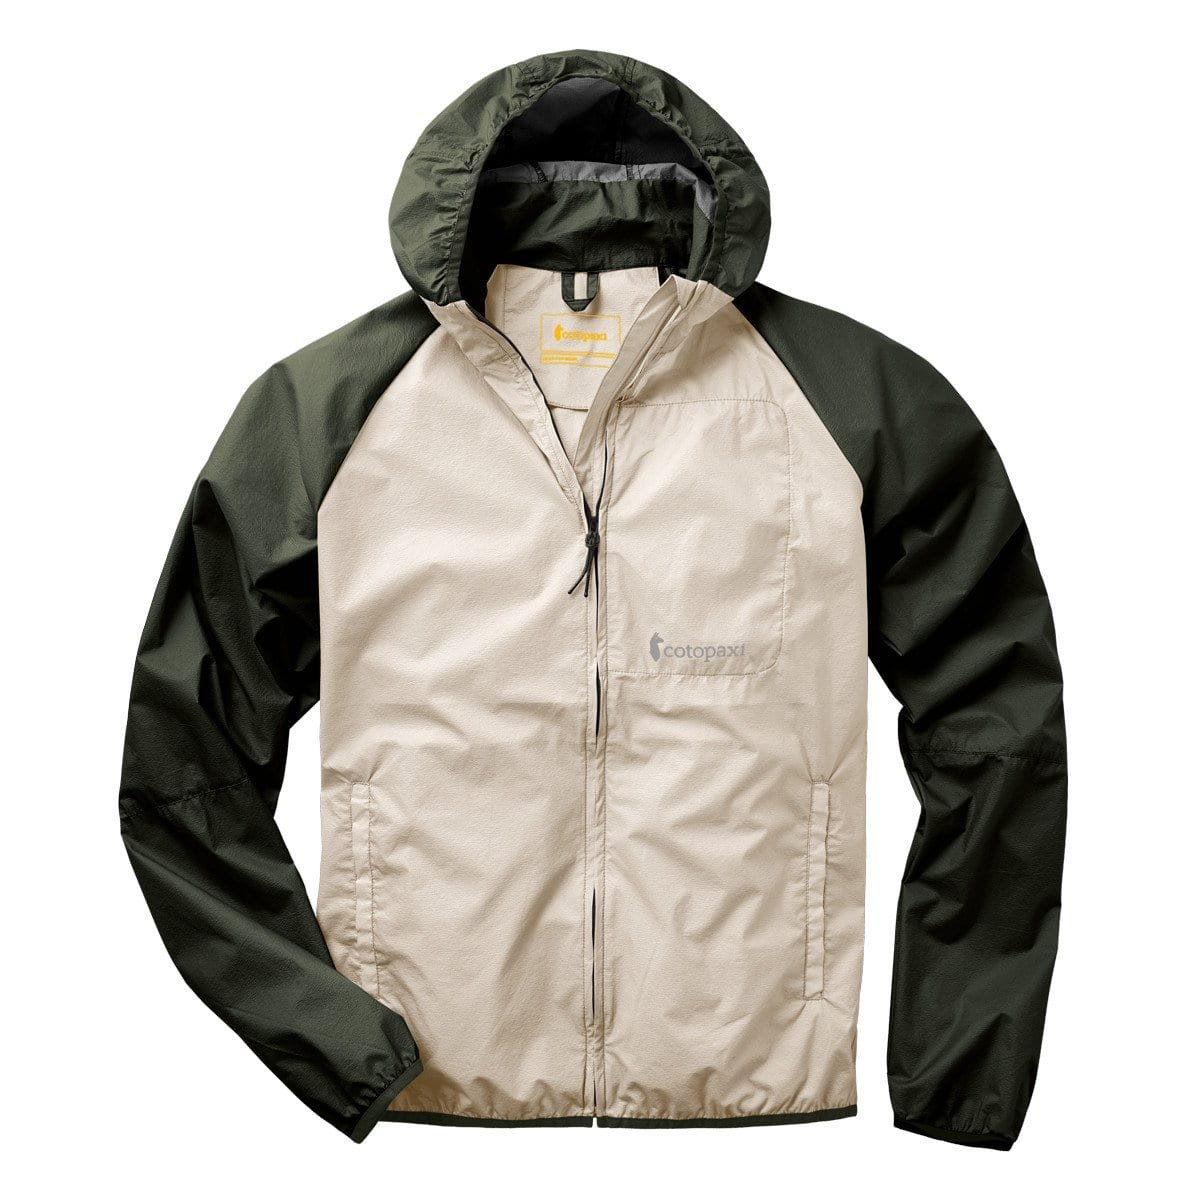 Cotopaxi Paray Lightweight Jacket - Men's - L/Cream/Cargo by Cotopaxi